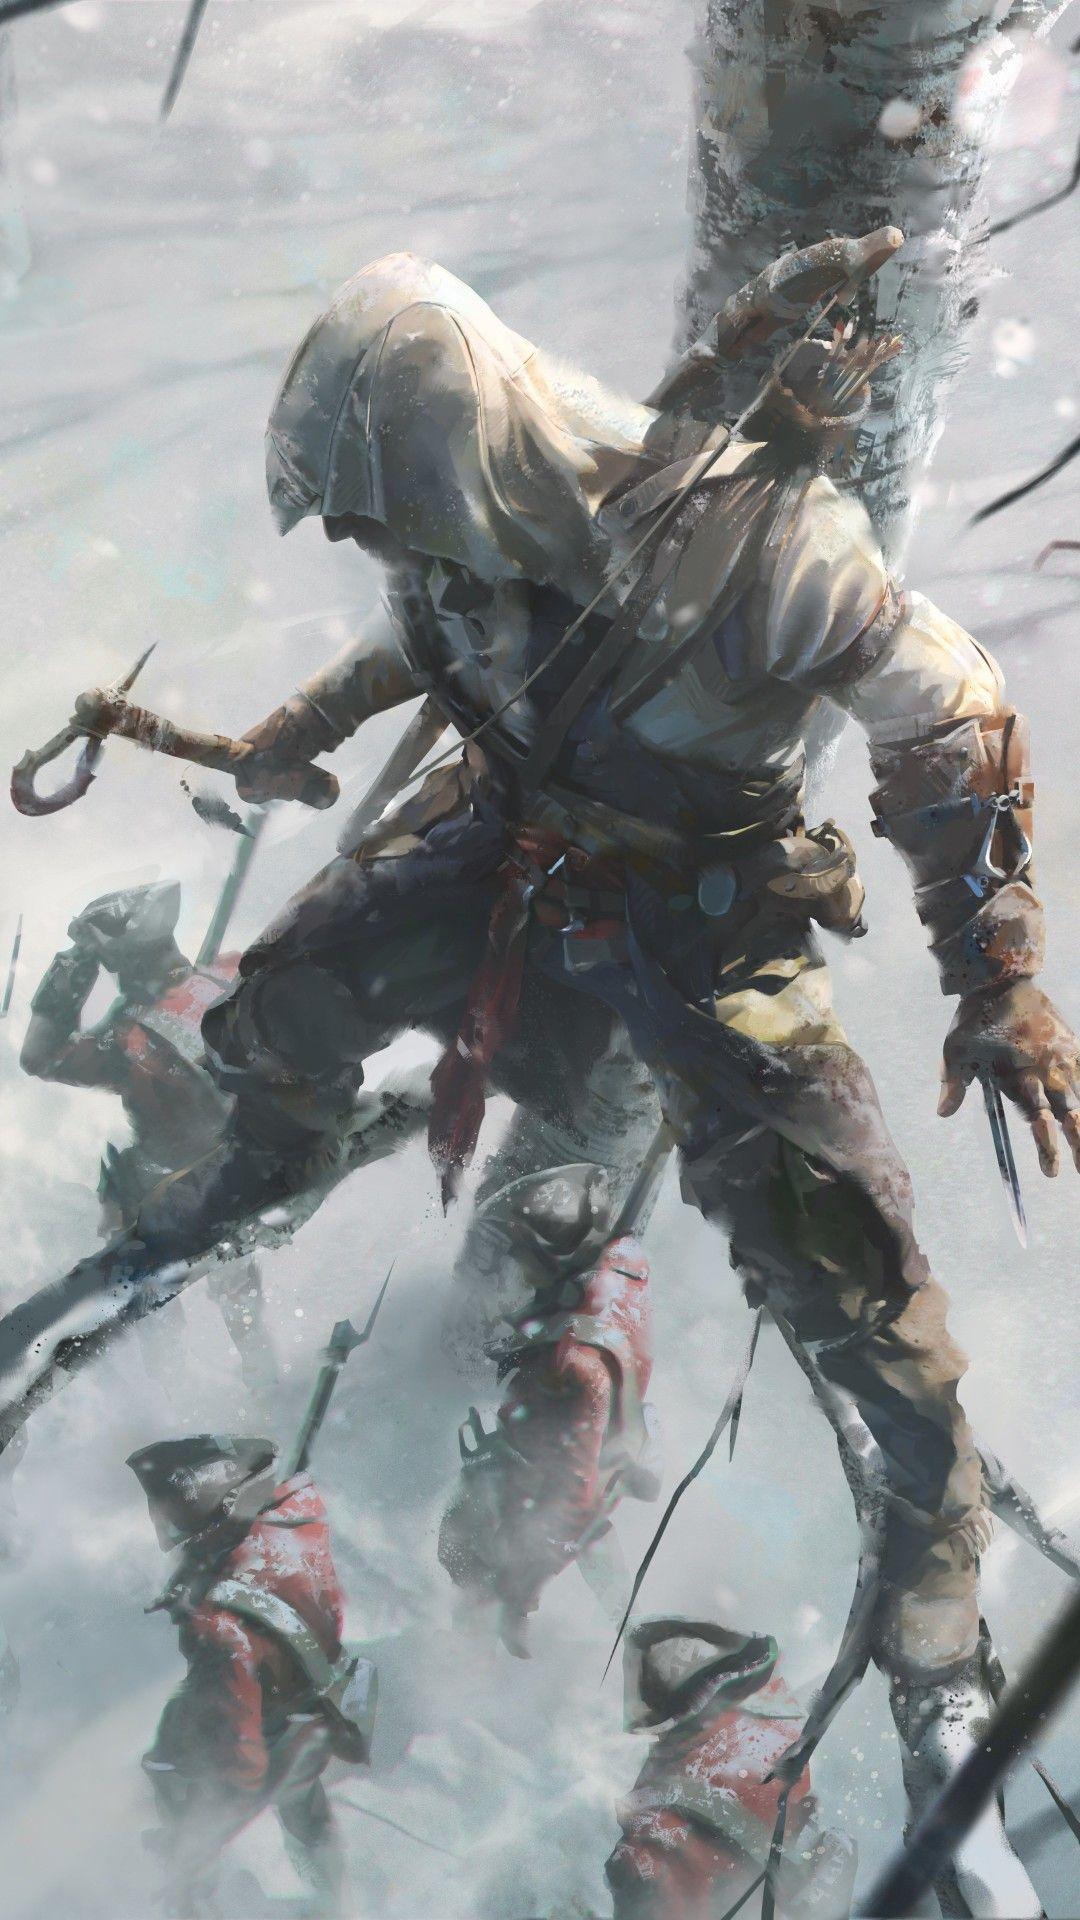 Assassins Creed 3 Key Art 8k Mobile Wall Wallpapers Assassins Creed Artwork Assassins Creed Game Assassins Creed